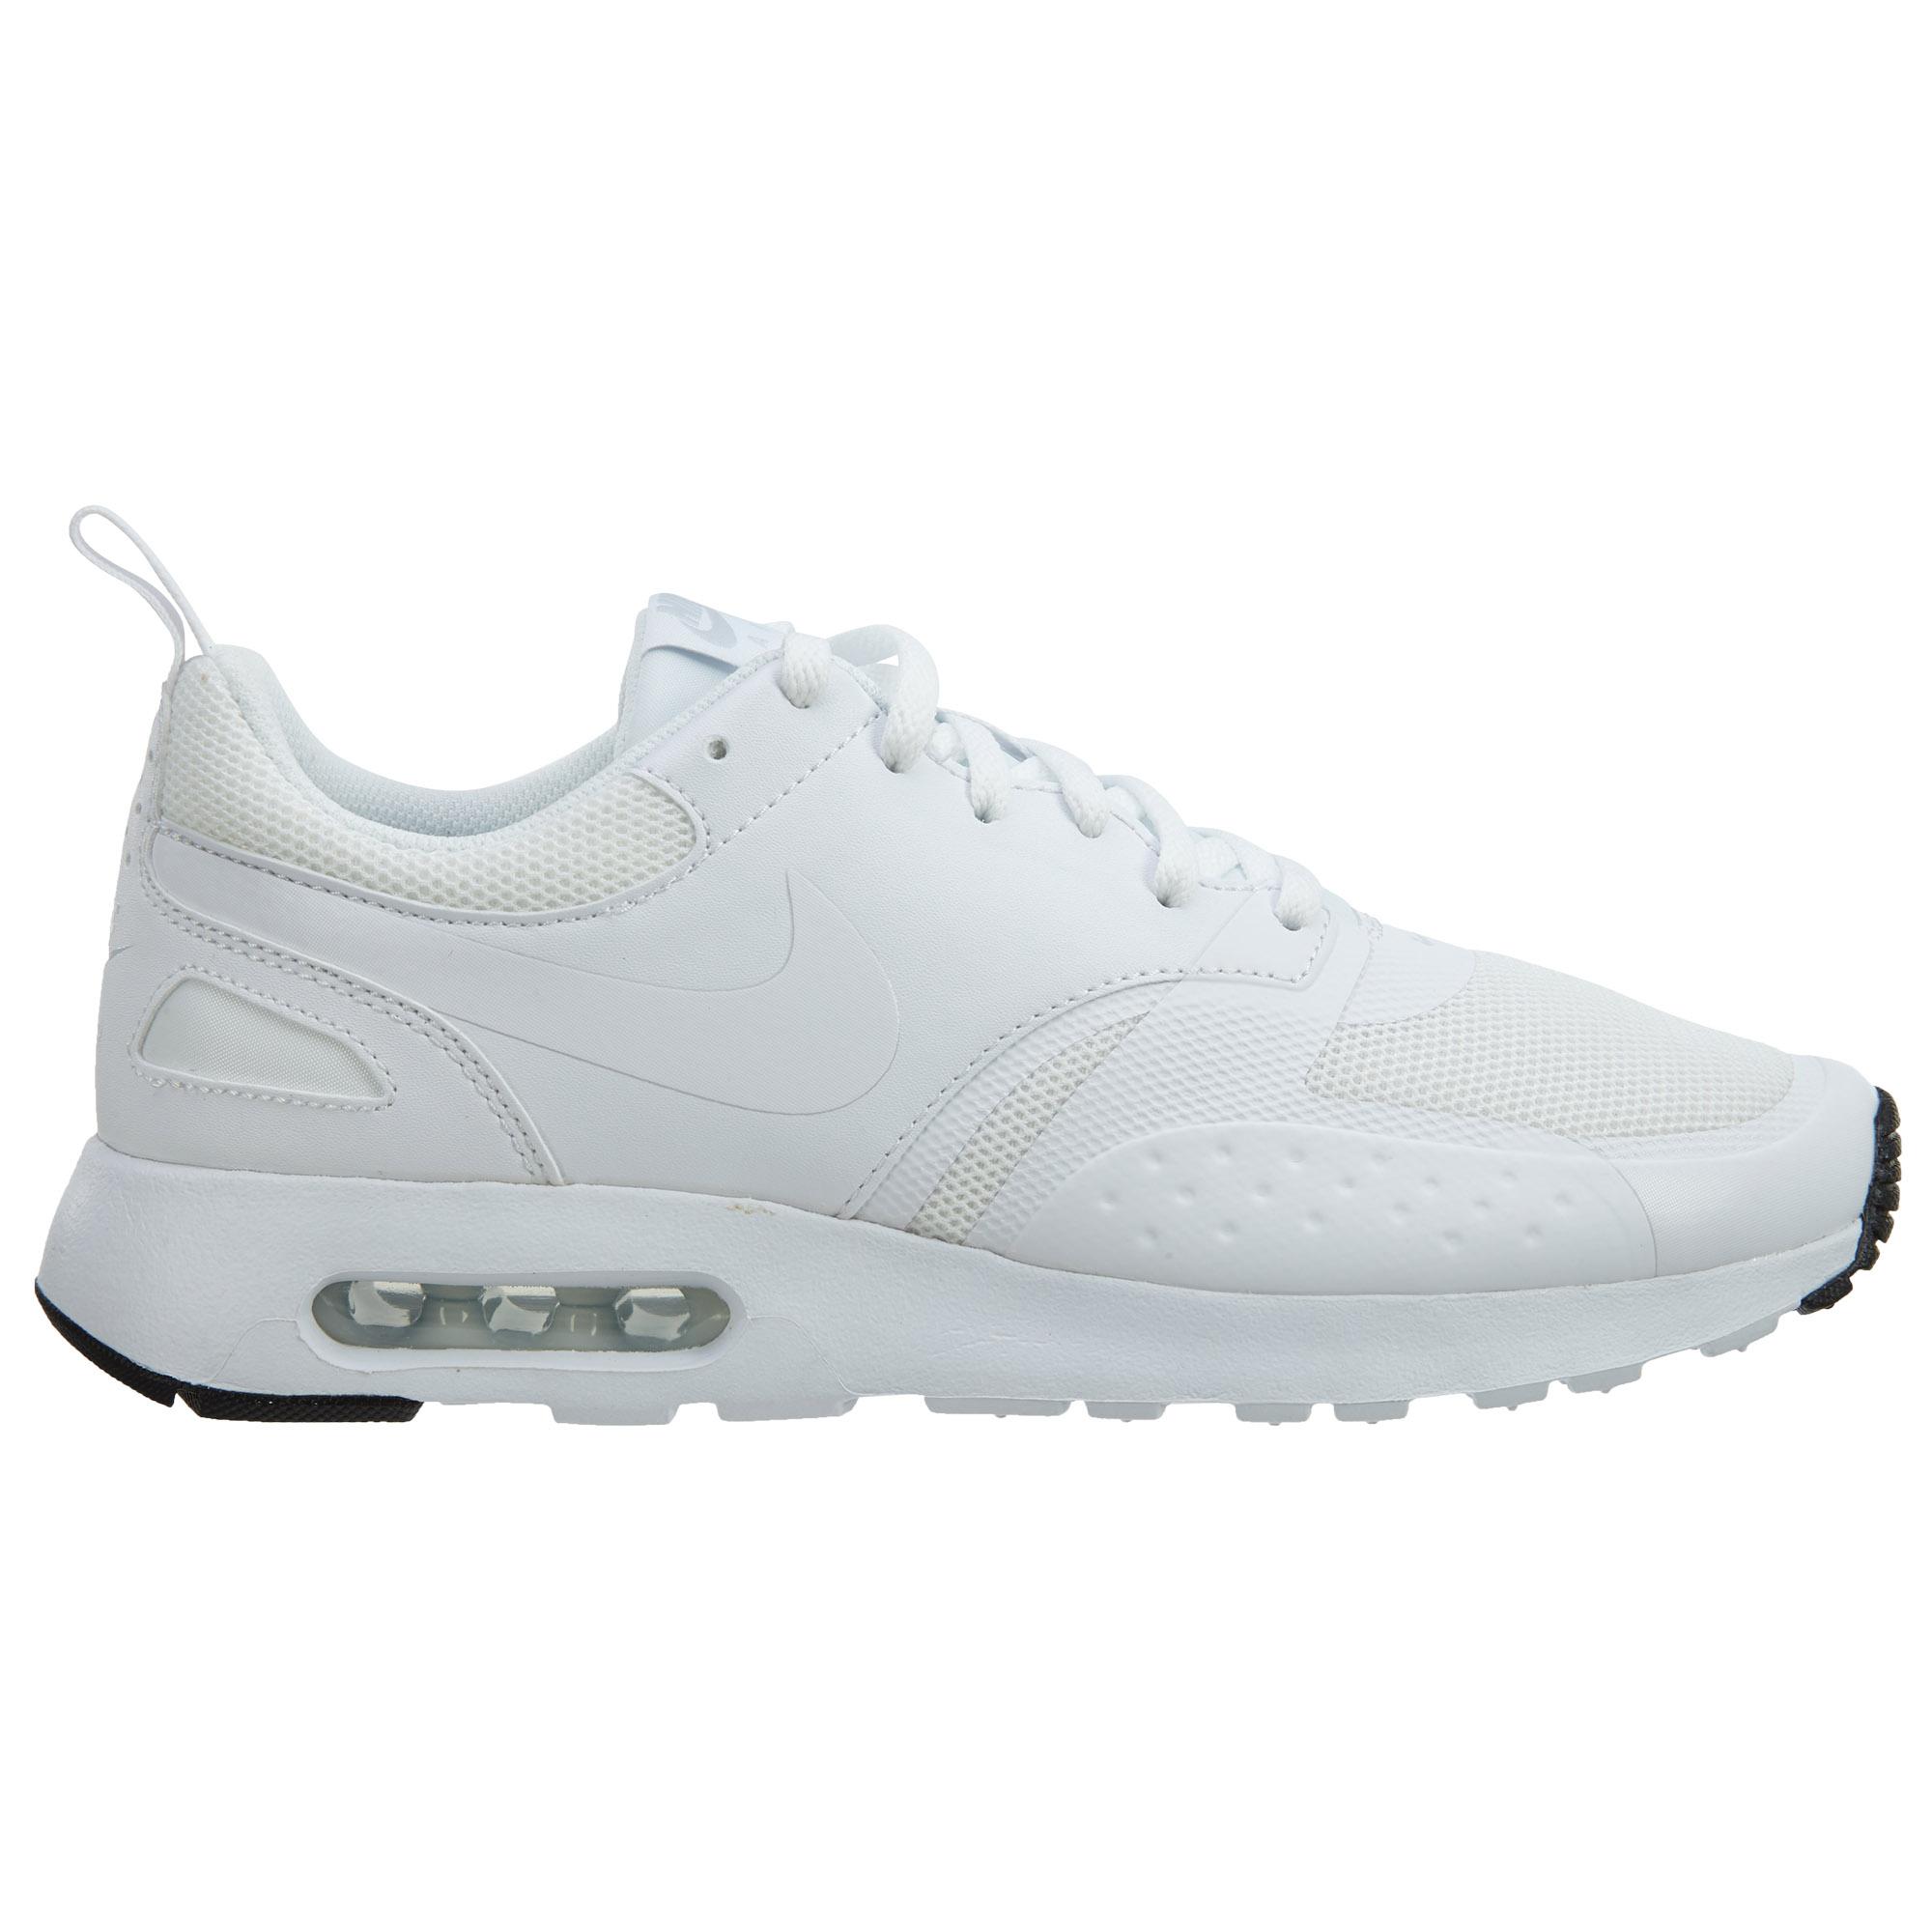 Nike Air Max Vision WhiteWhite Pure Platinum